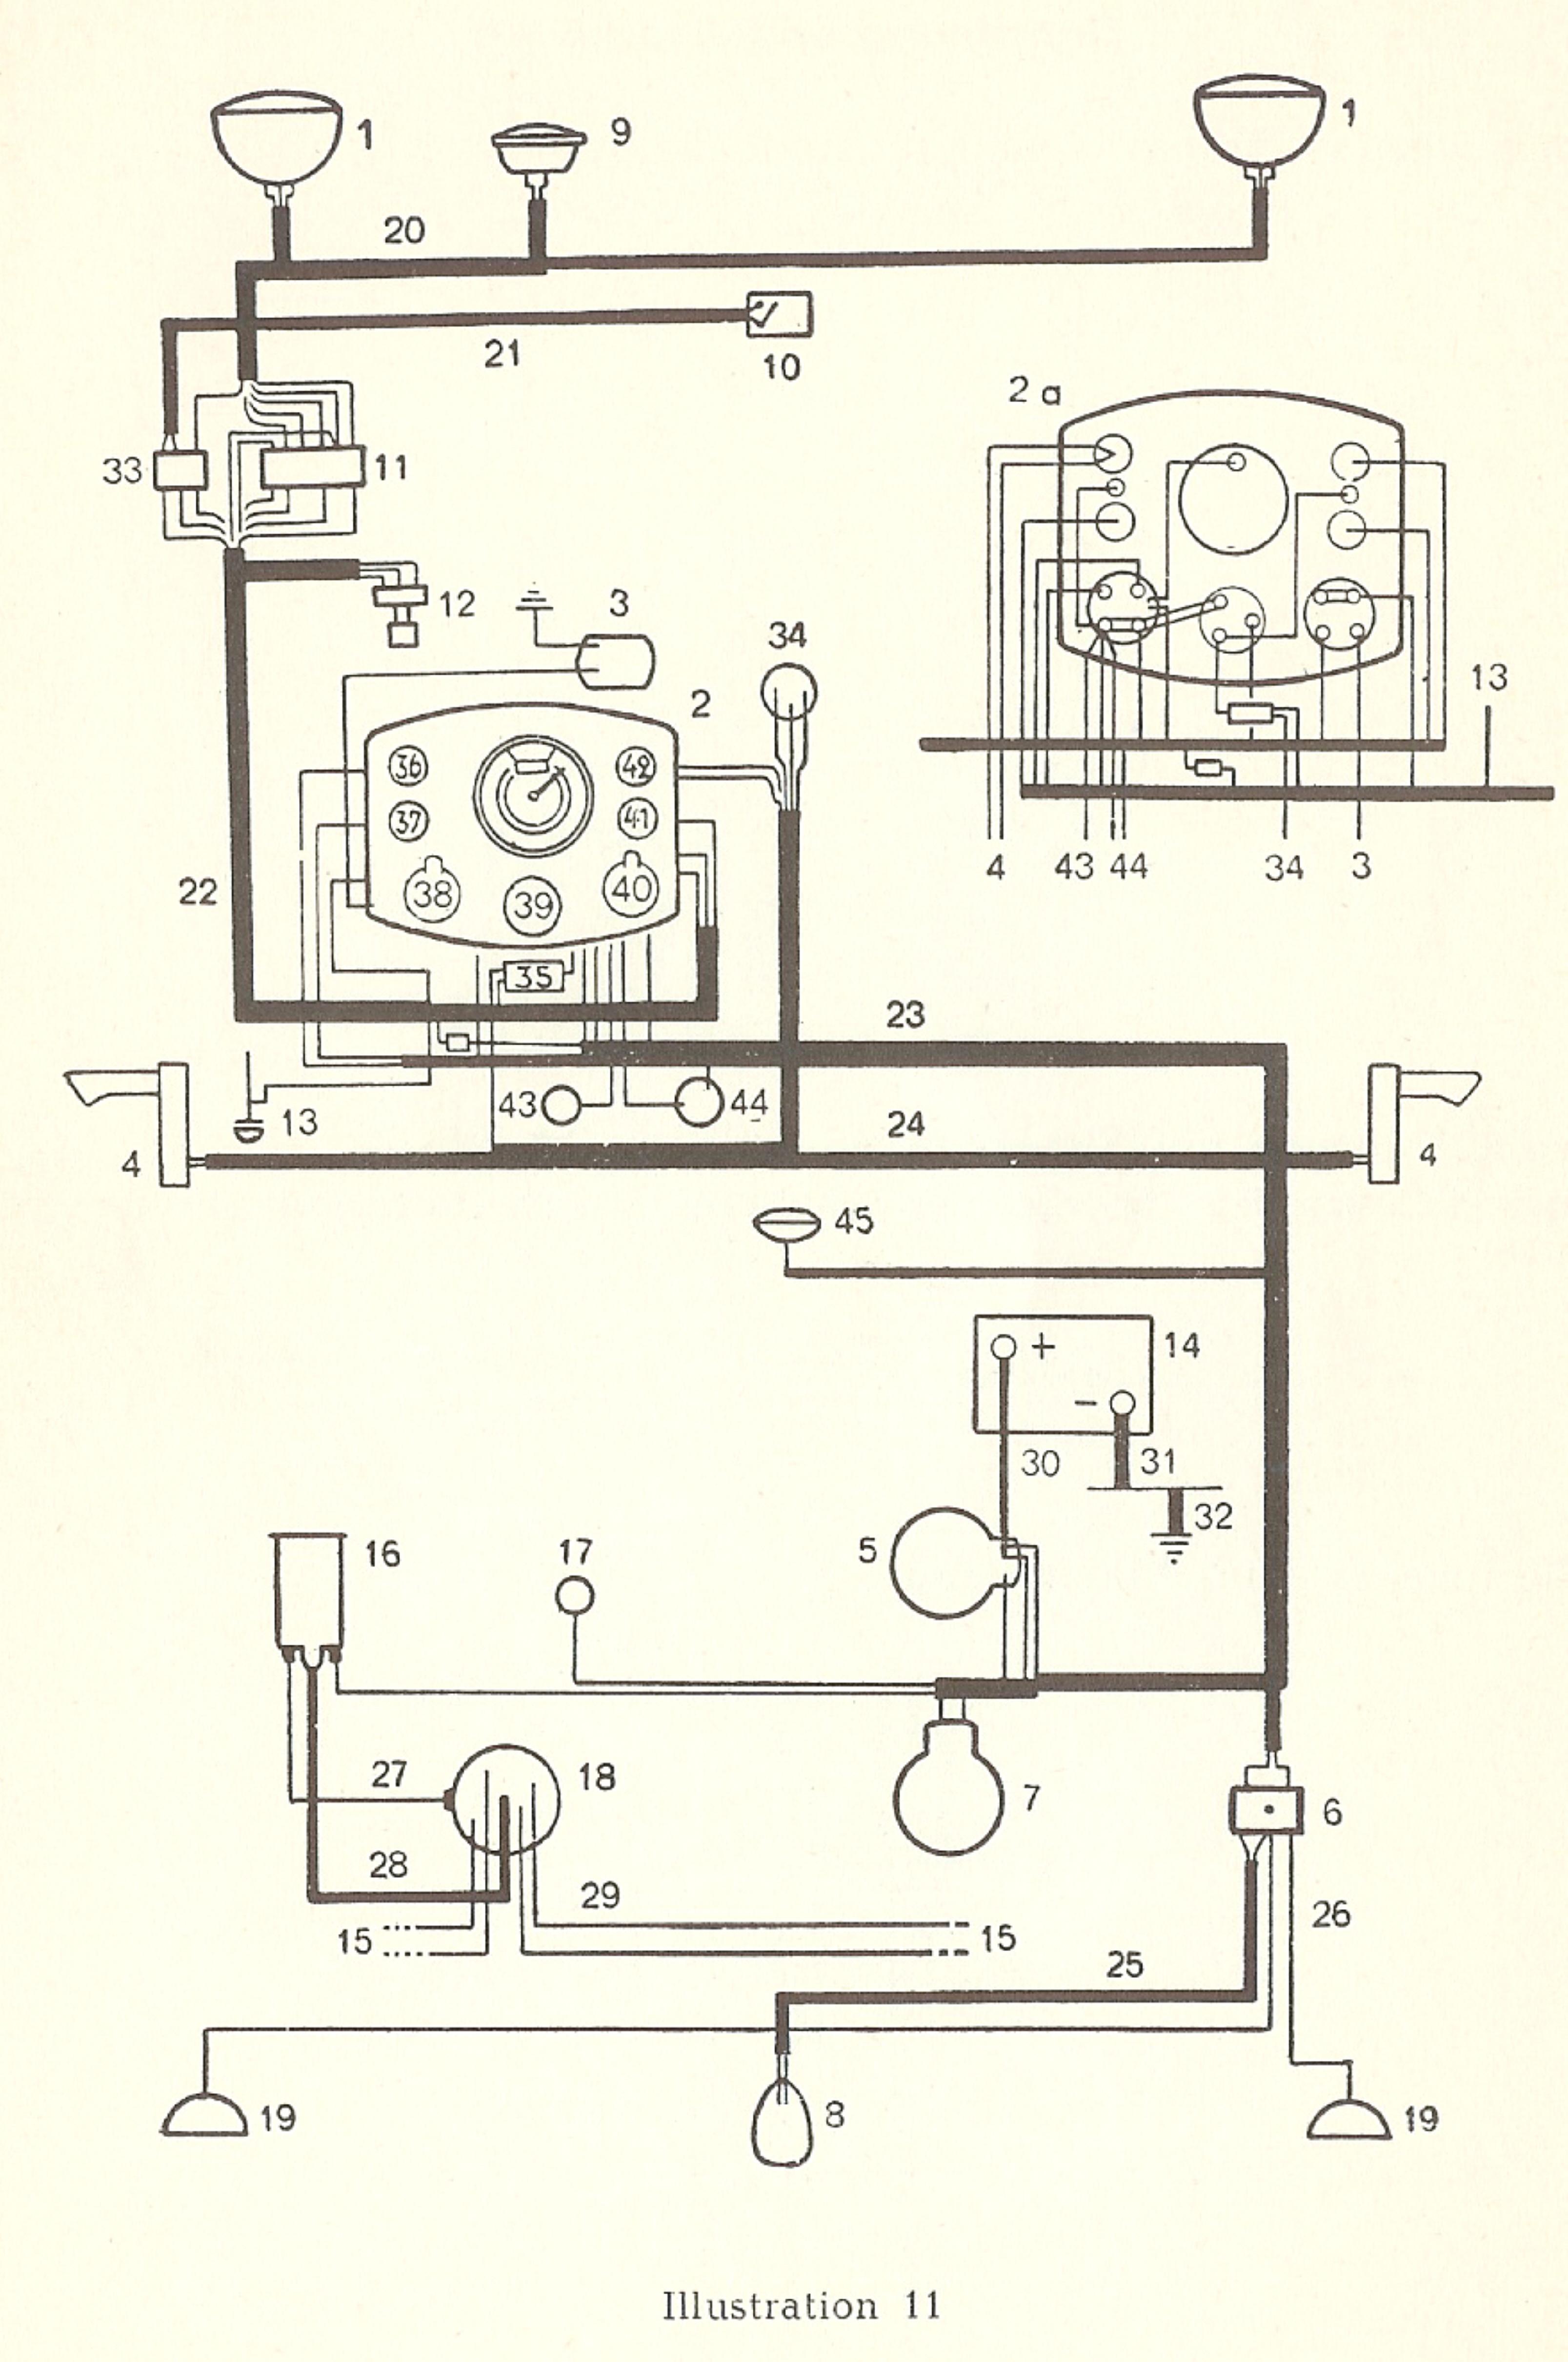 WRG-0325] 11x17 Color Wiring Diagram 1971 Vw Super Beetle Bug on